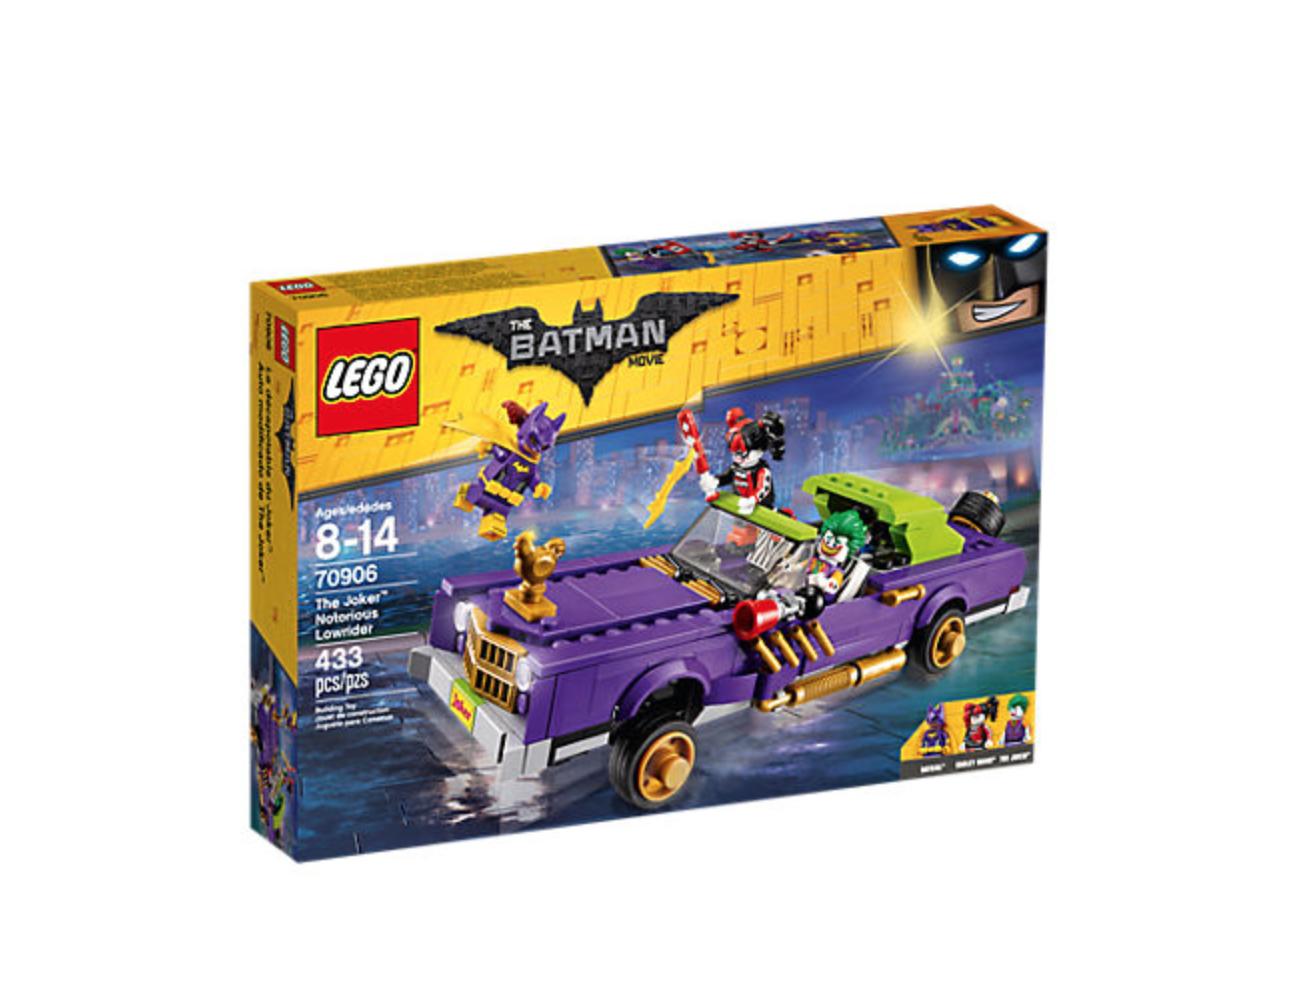 LEGO Batman Movie Line Coming January 1st